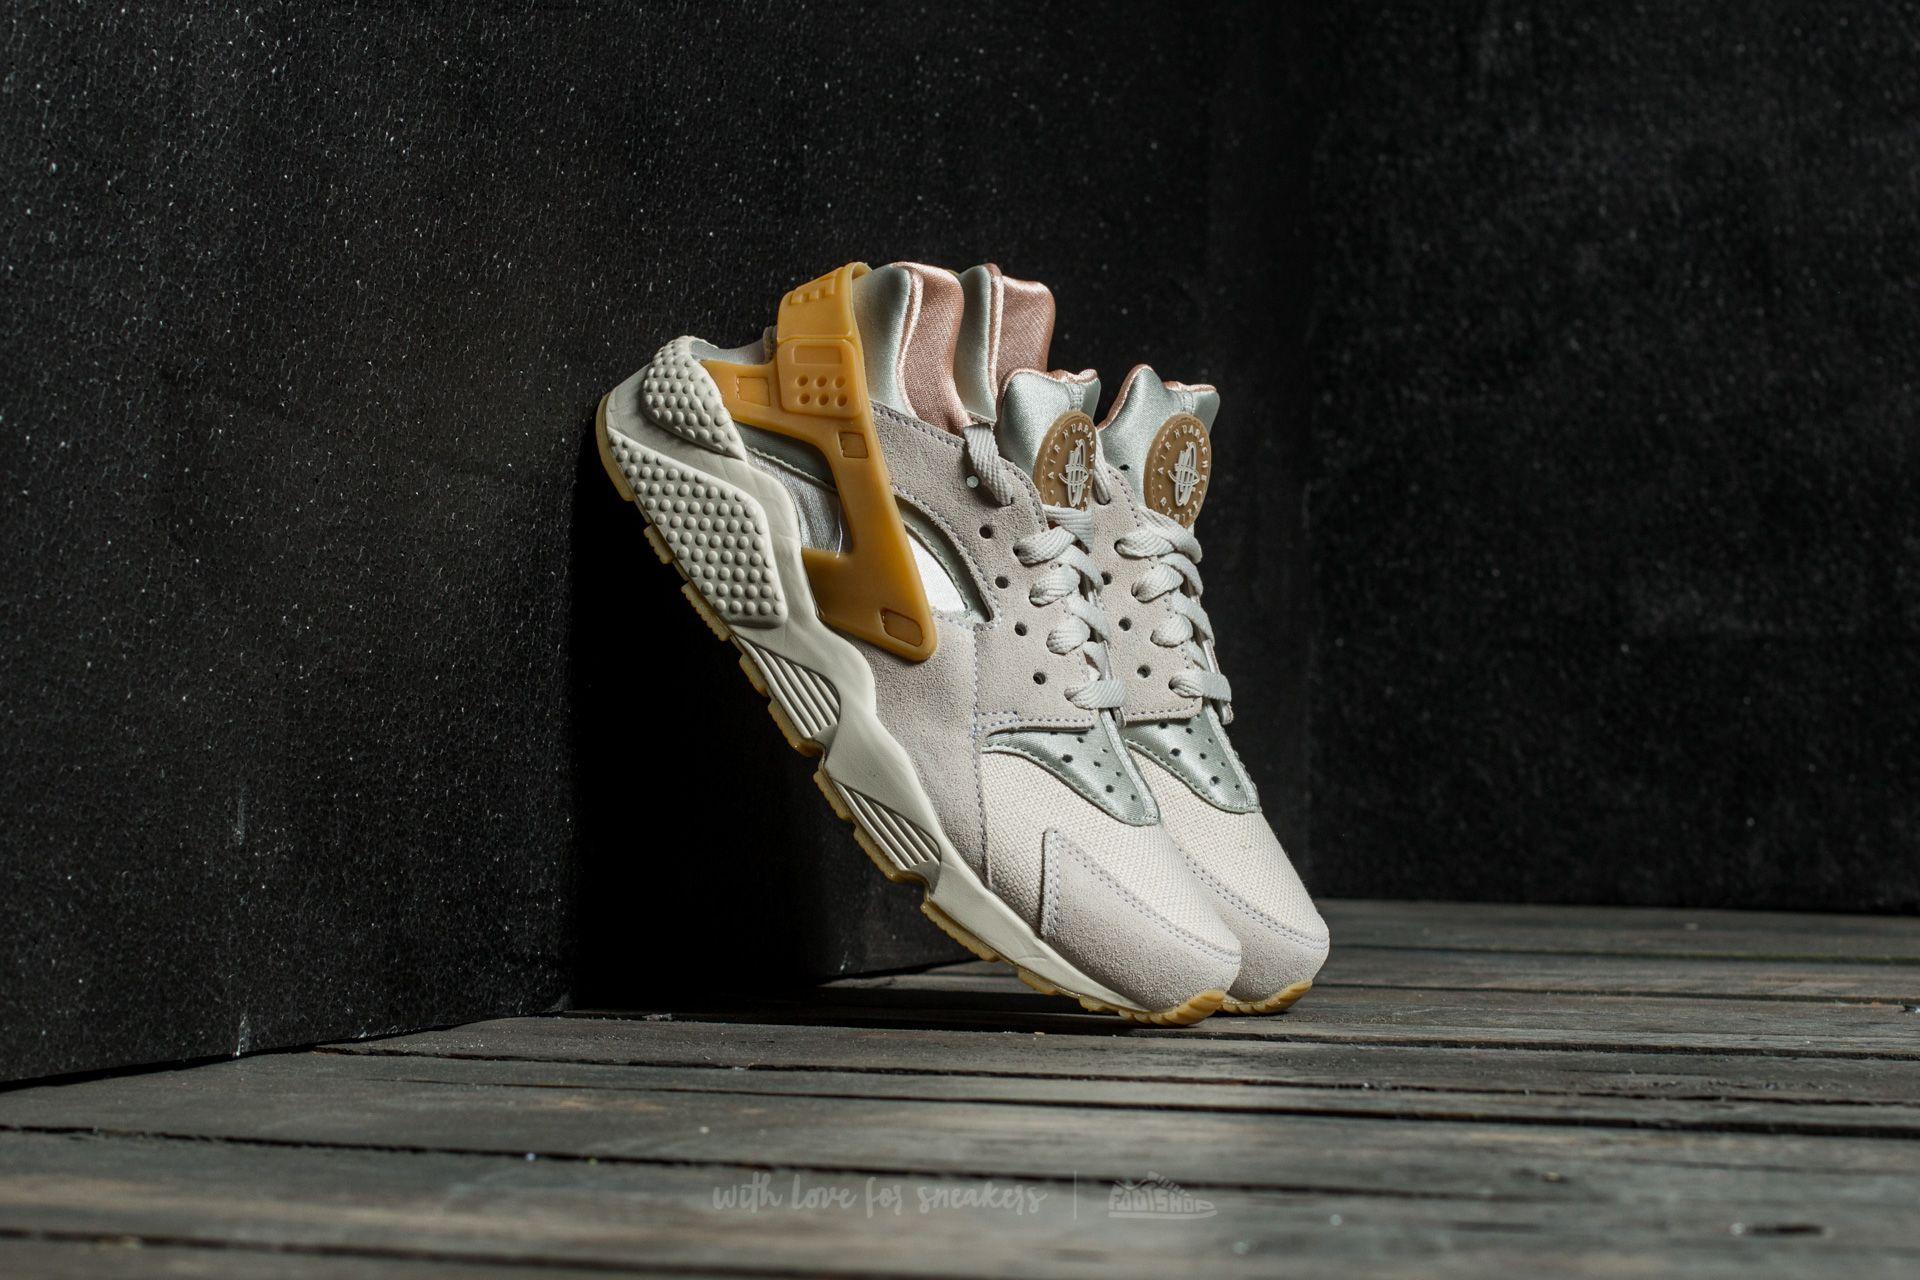 99234276047b Nike Air Huarache Run SE Phantom  Gum Yellow-Light Bone